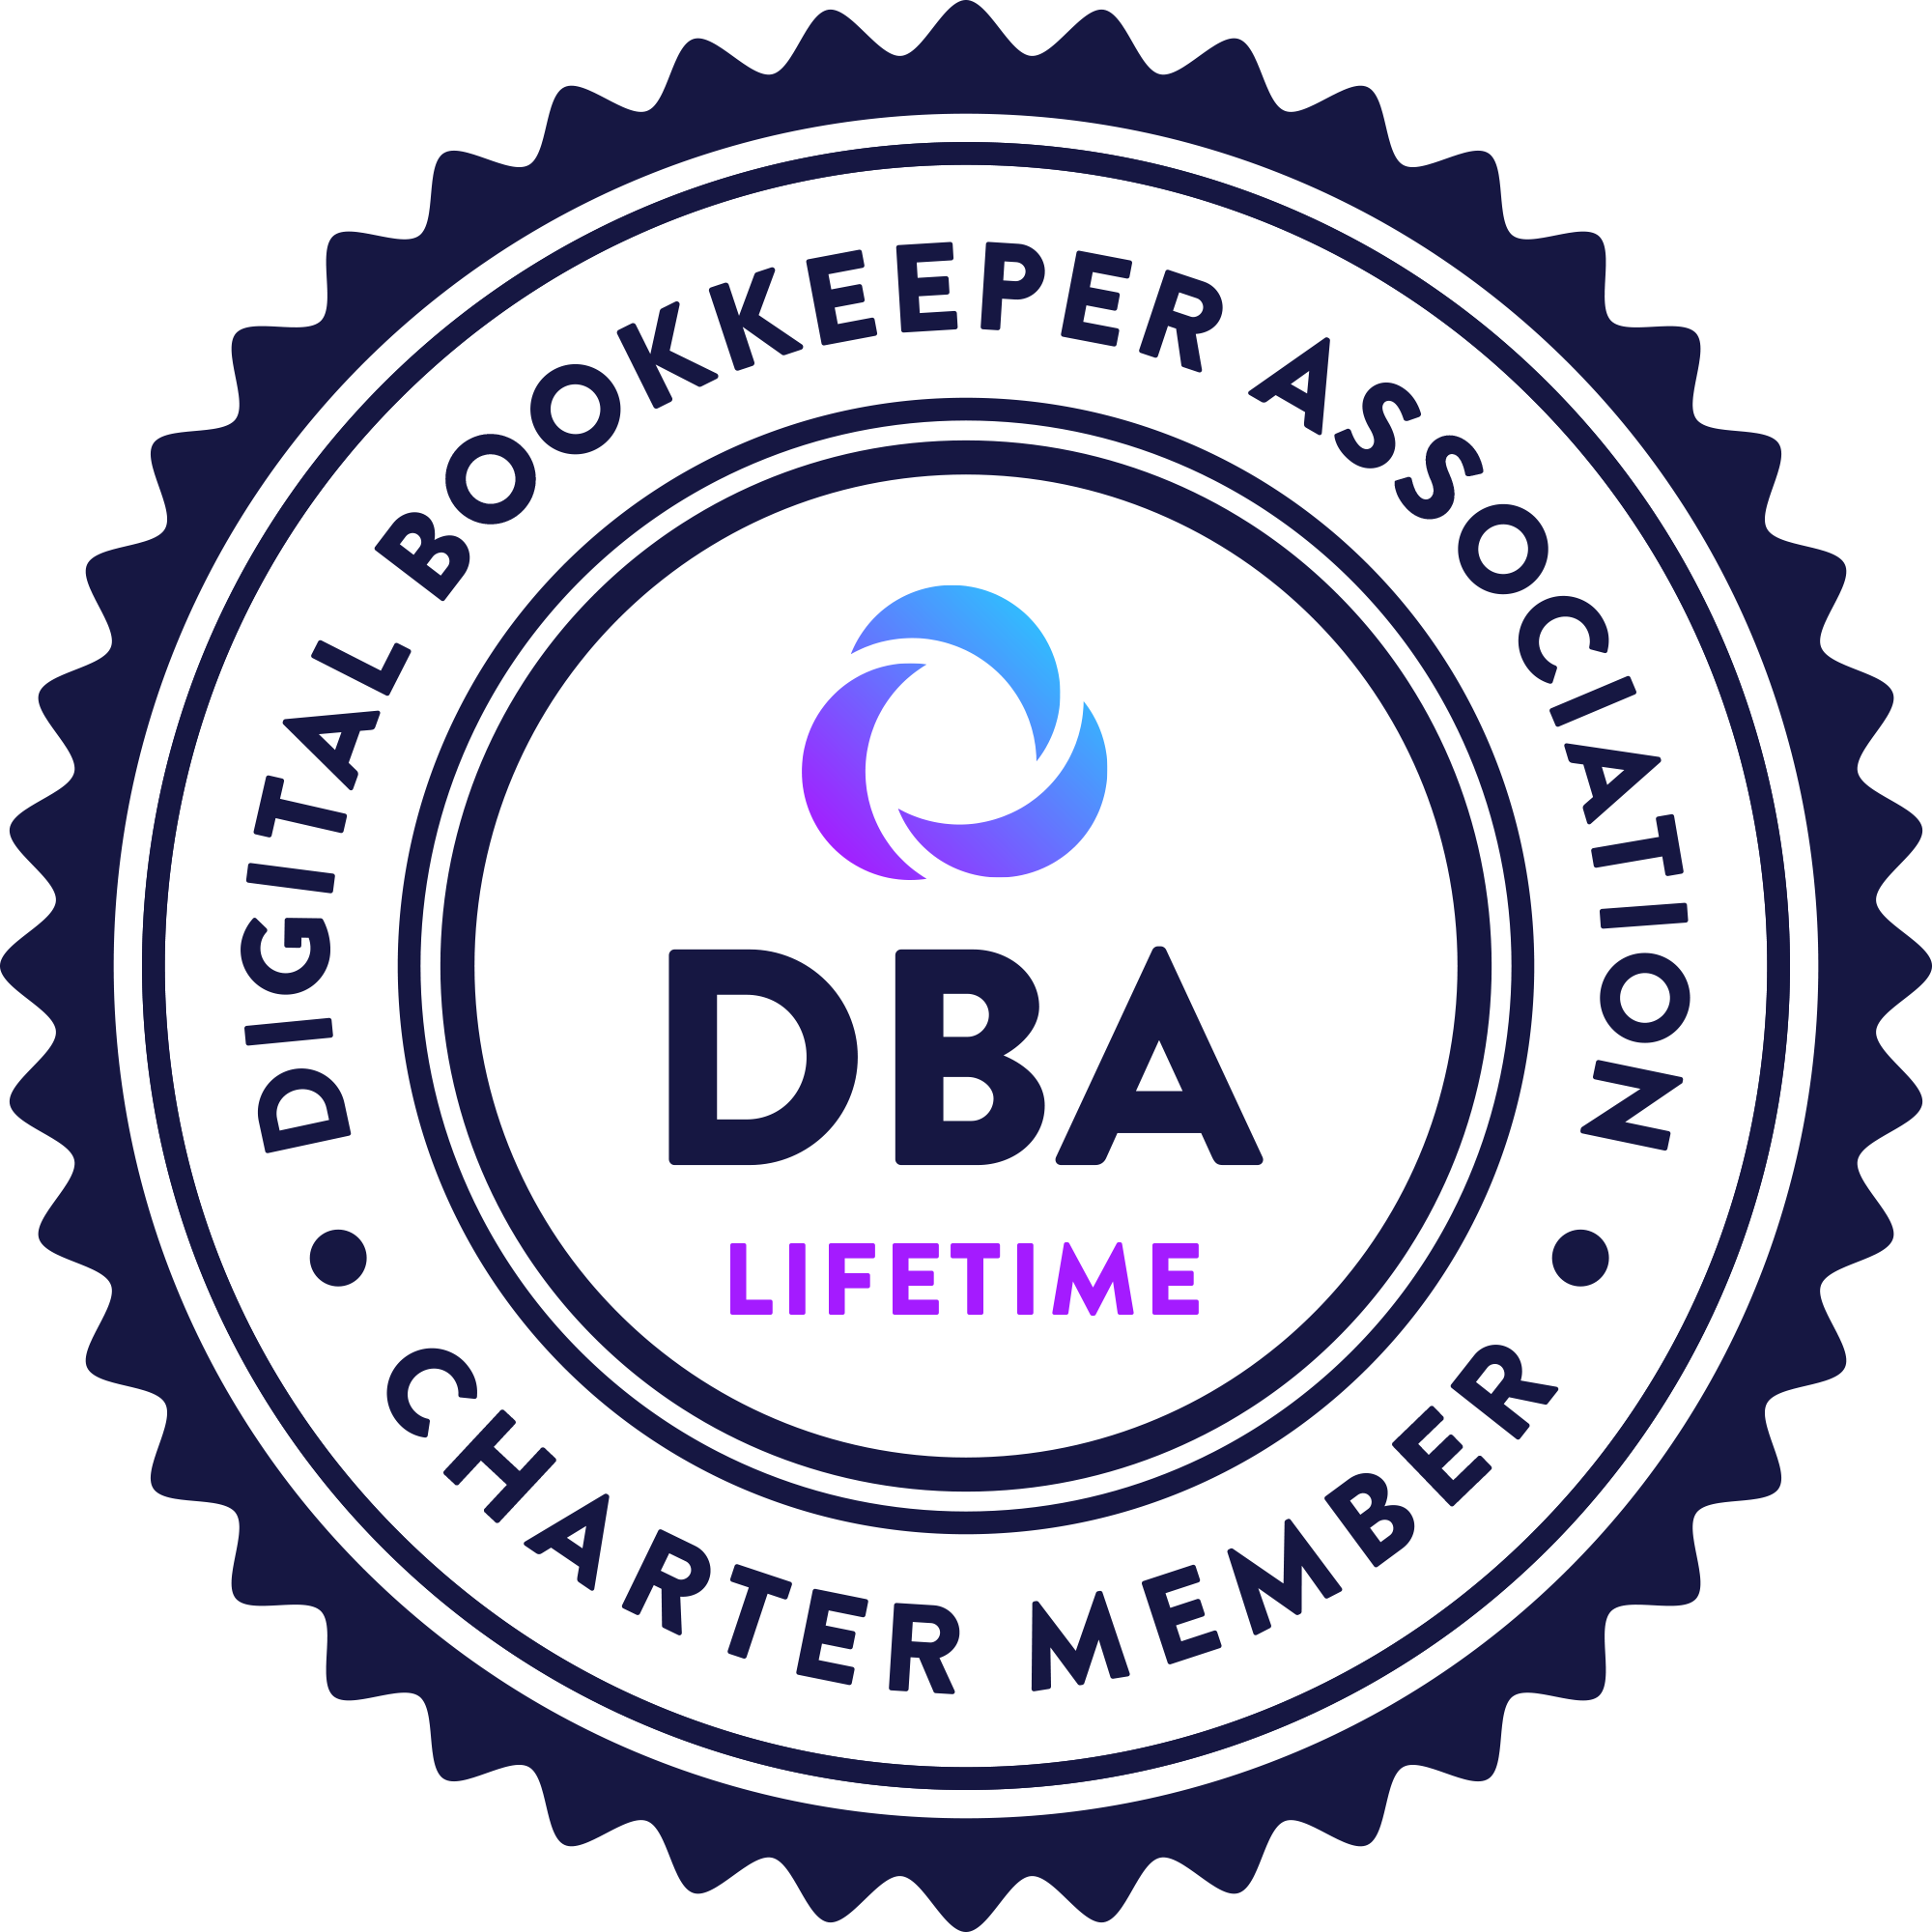 Digital Bookkeeper Association Lifetime Charter Member